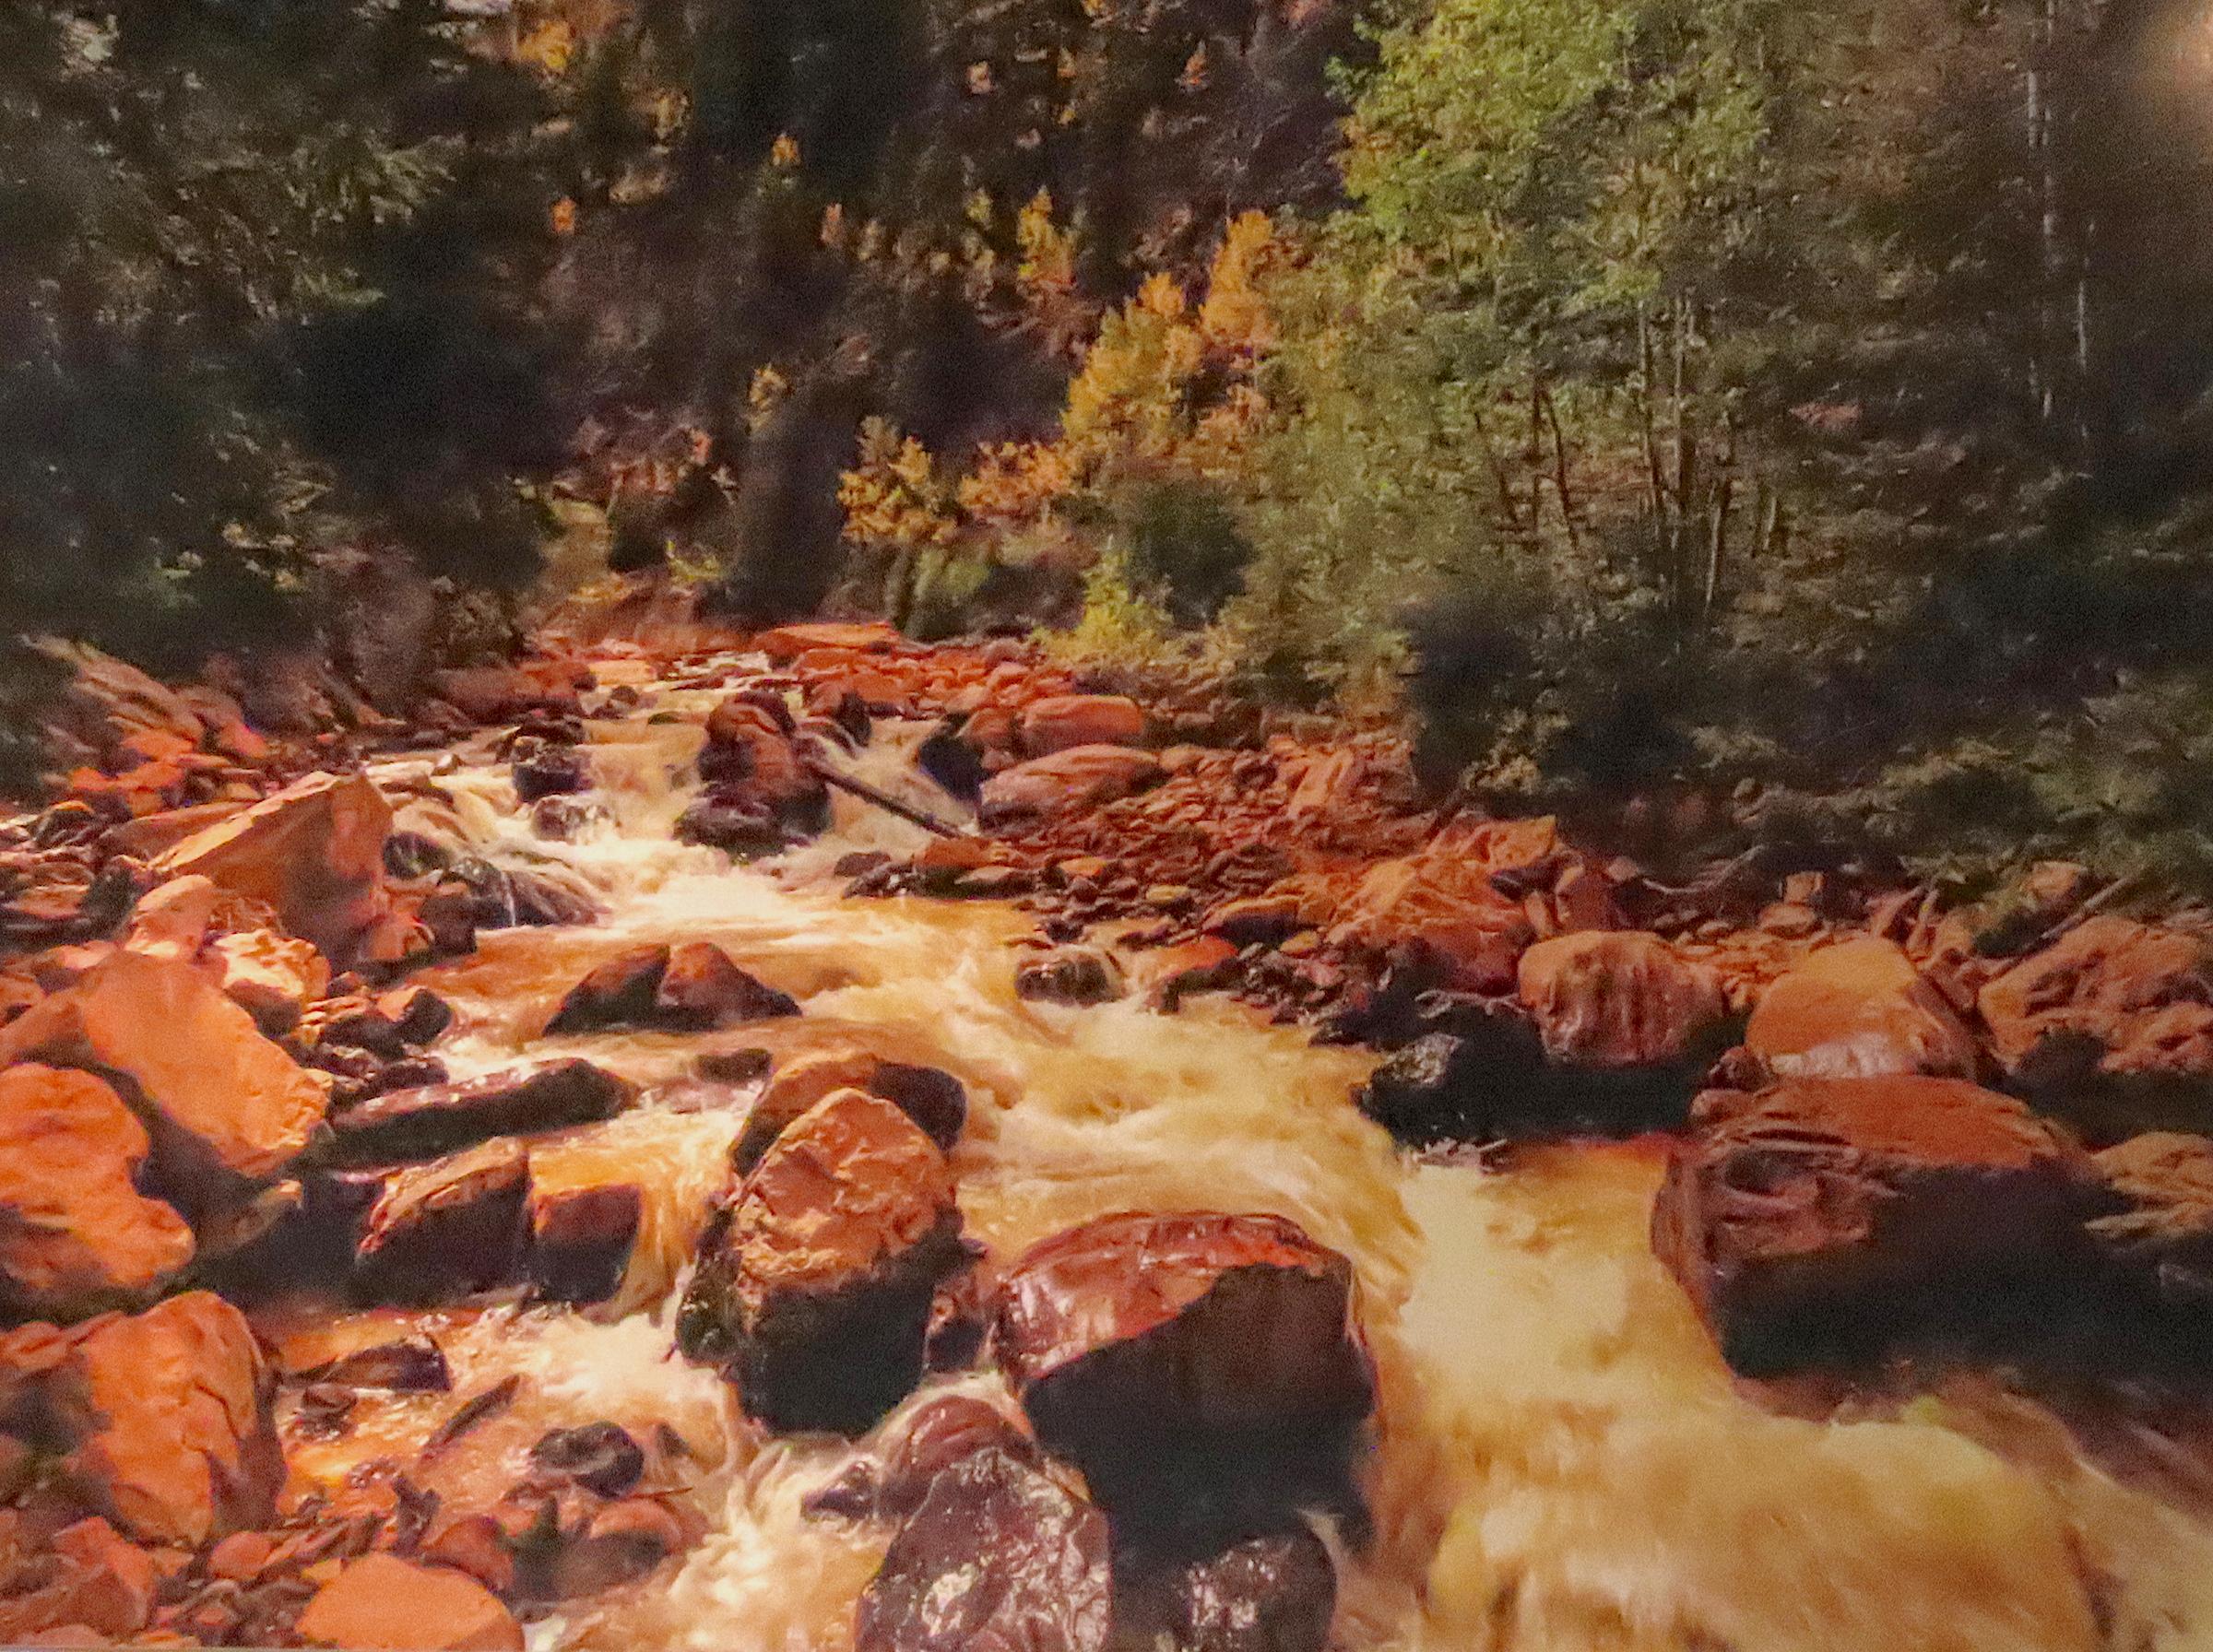 """Red Mountain Creek"" by Rick Jones"